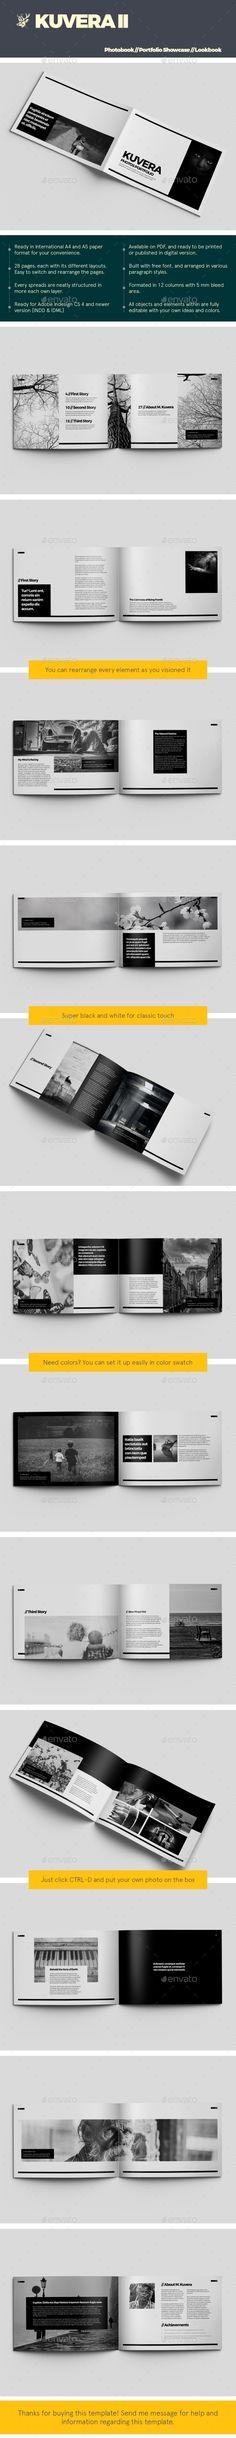 Kuvera II A4 & A5 Photobook & Portfolio Showcase - #Photo #Albums Print #Templates Download here: https://graphicriver.net/item/kuvera-ii-a4-a5-photobook-portfolio-showcase/19277753?ref=alena994